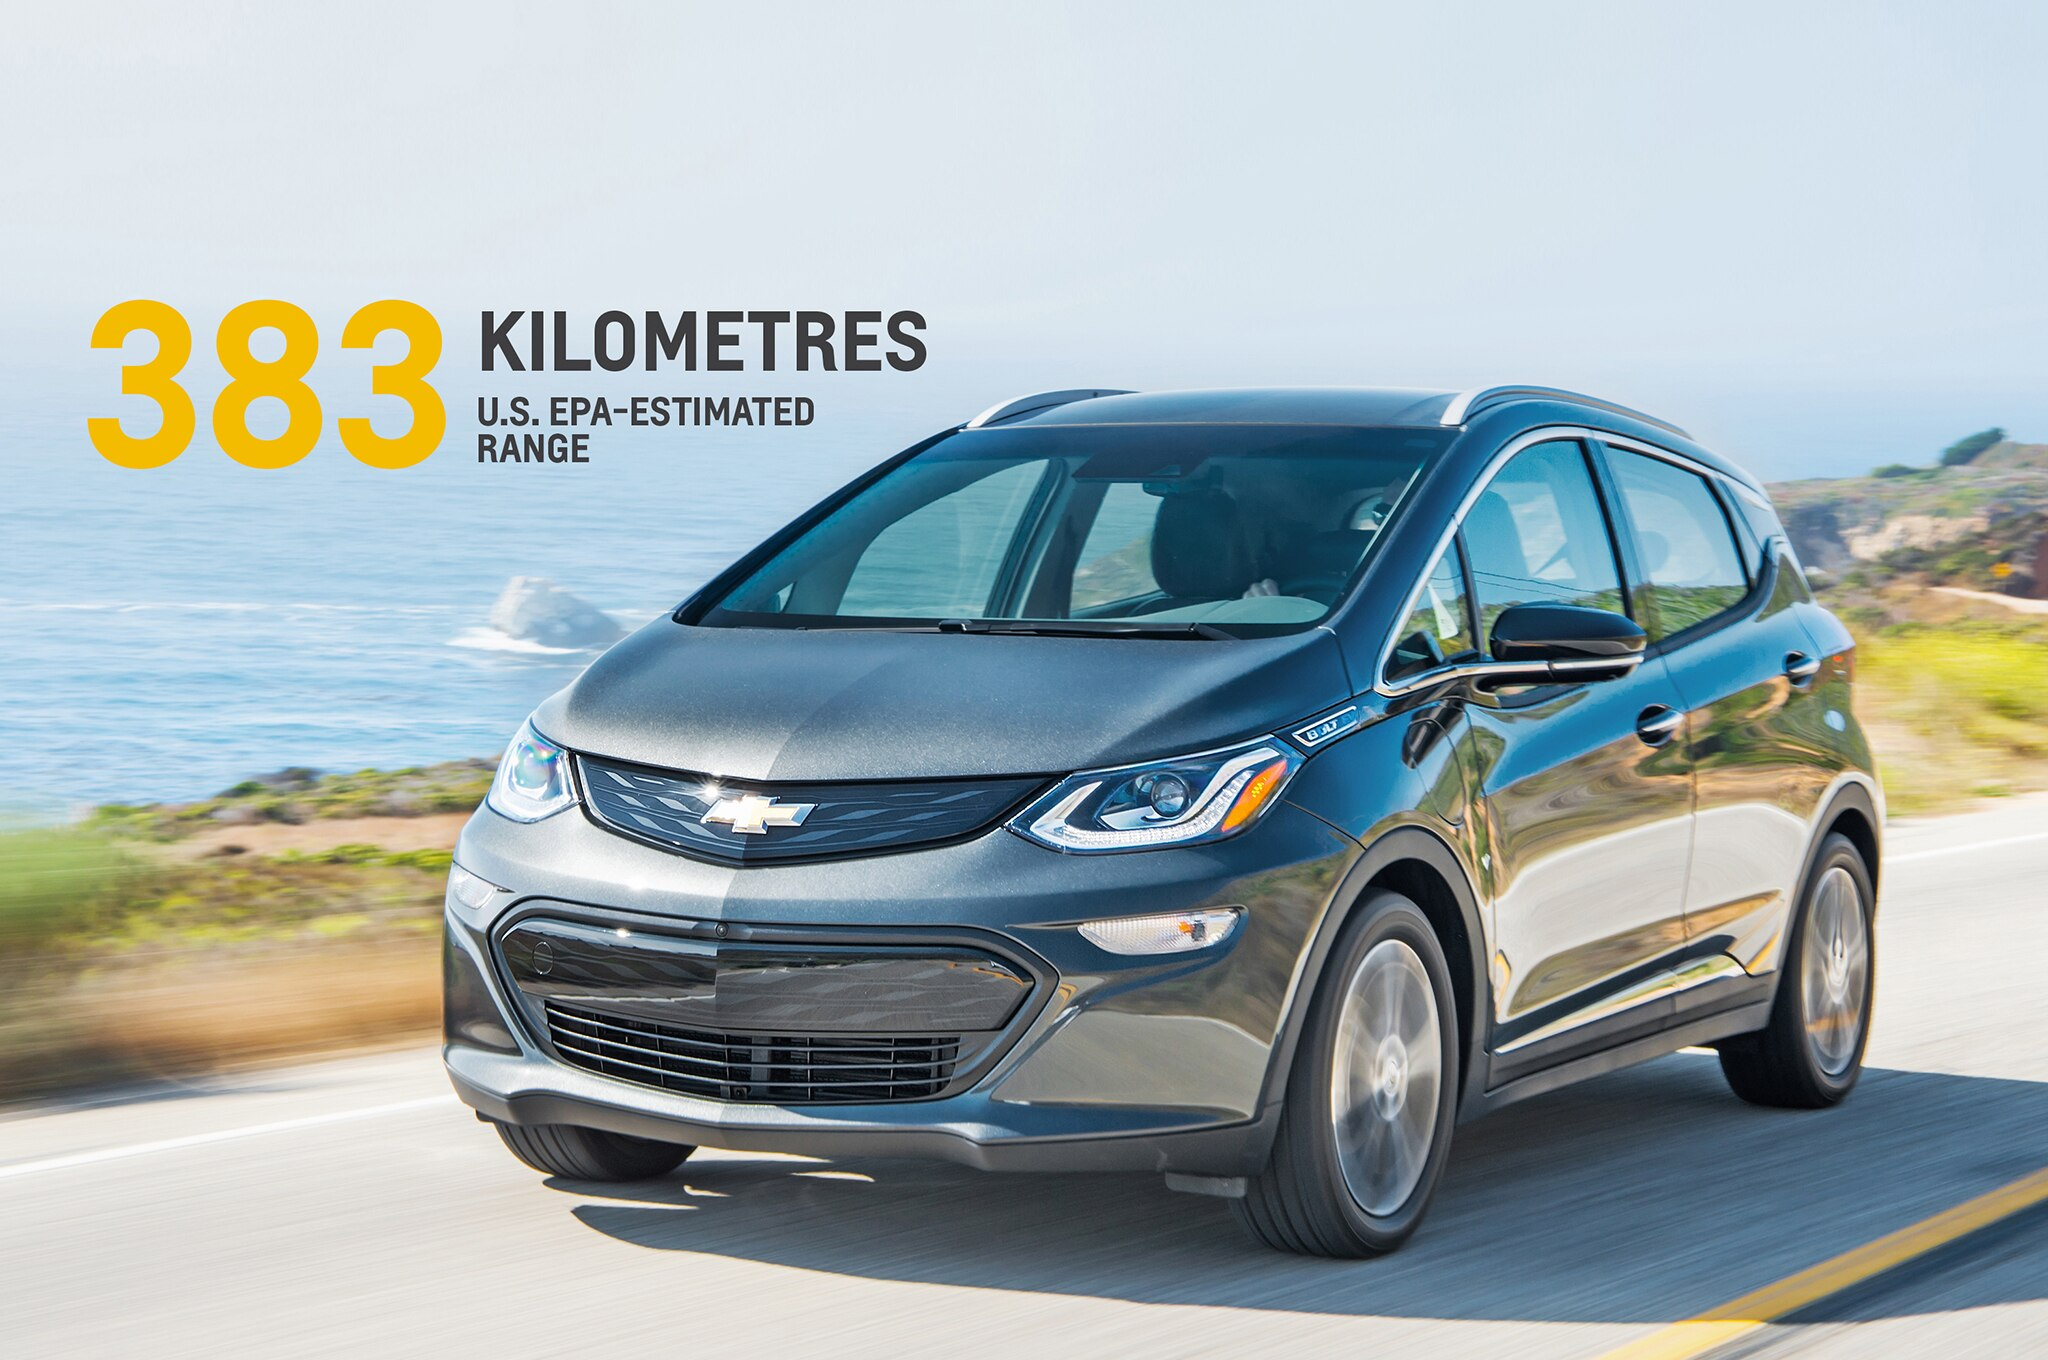 2017 Chevrolet Bolt EV EPA Estimated Range